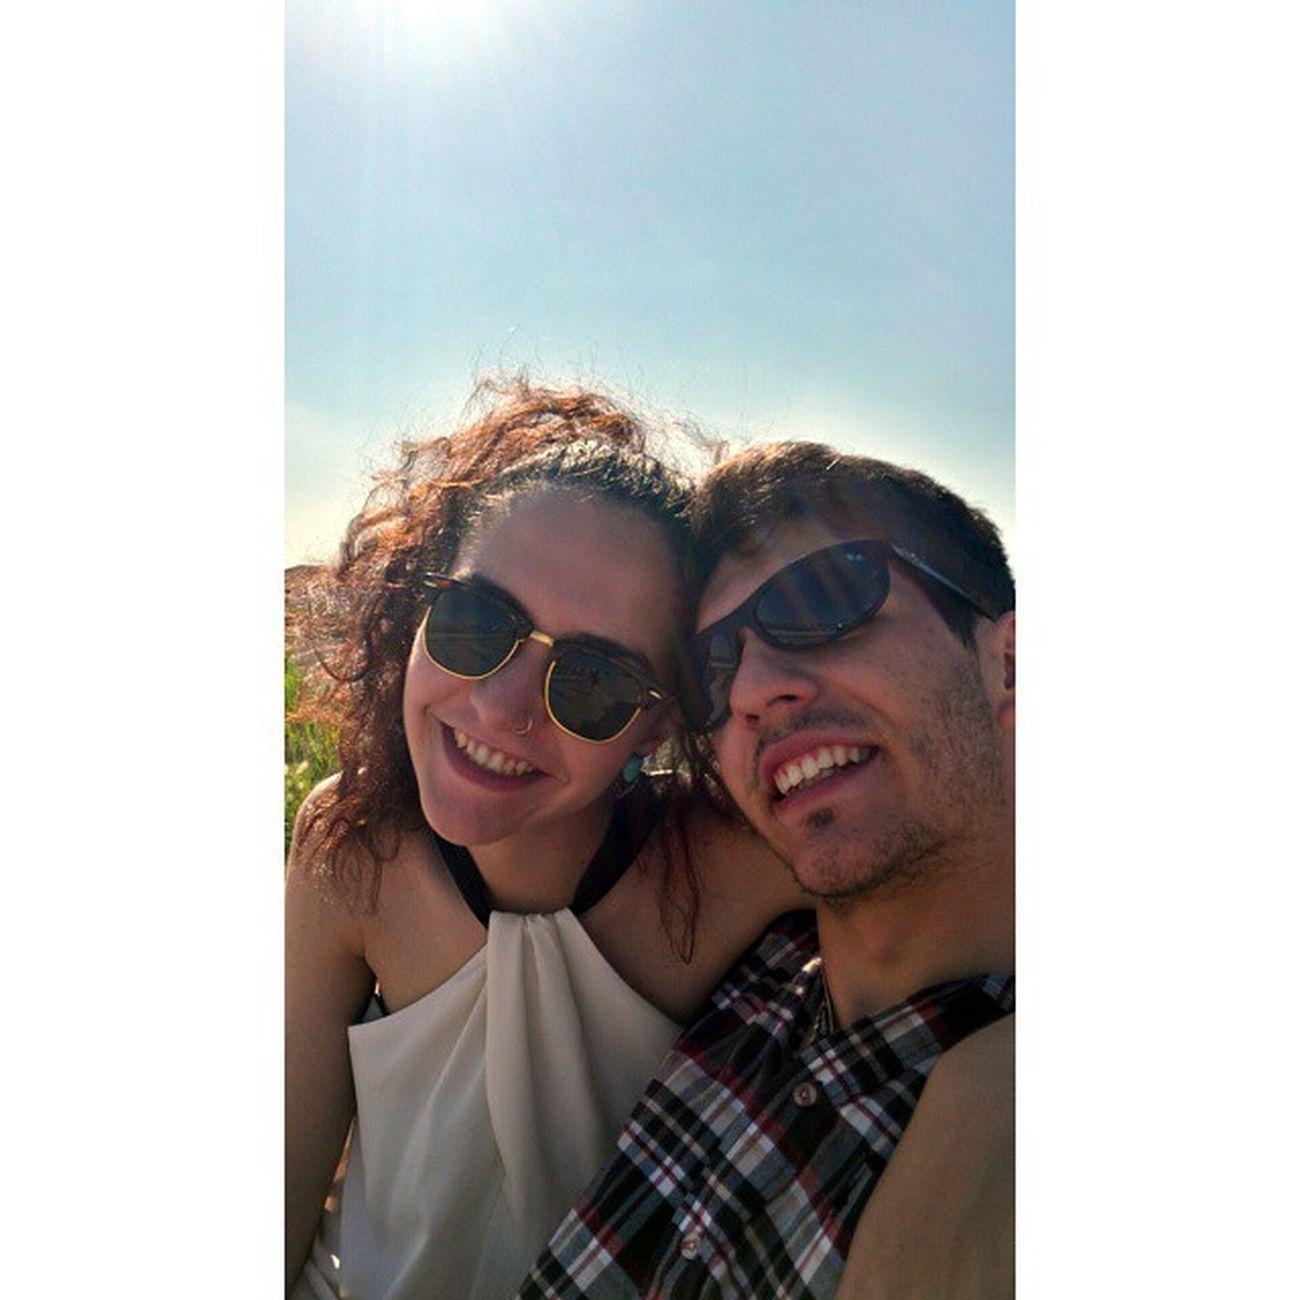 Date with my girl Lifepartner Foreverbyyourside Loveyoutothemoonandback Dating Endless Vscocam Photos Photografy Photooftheday